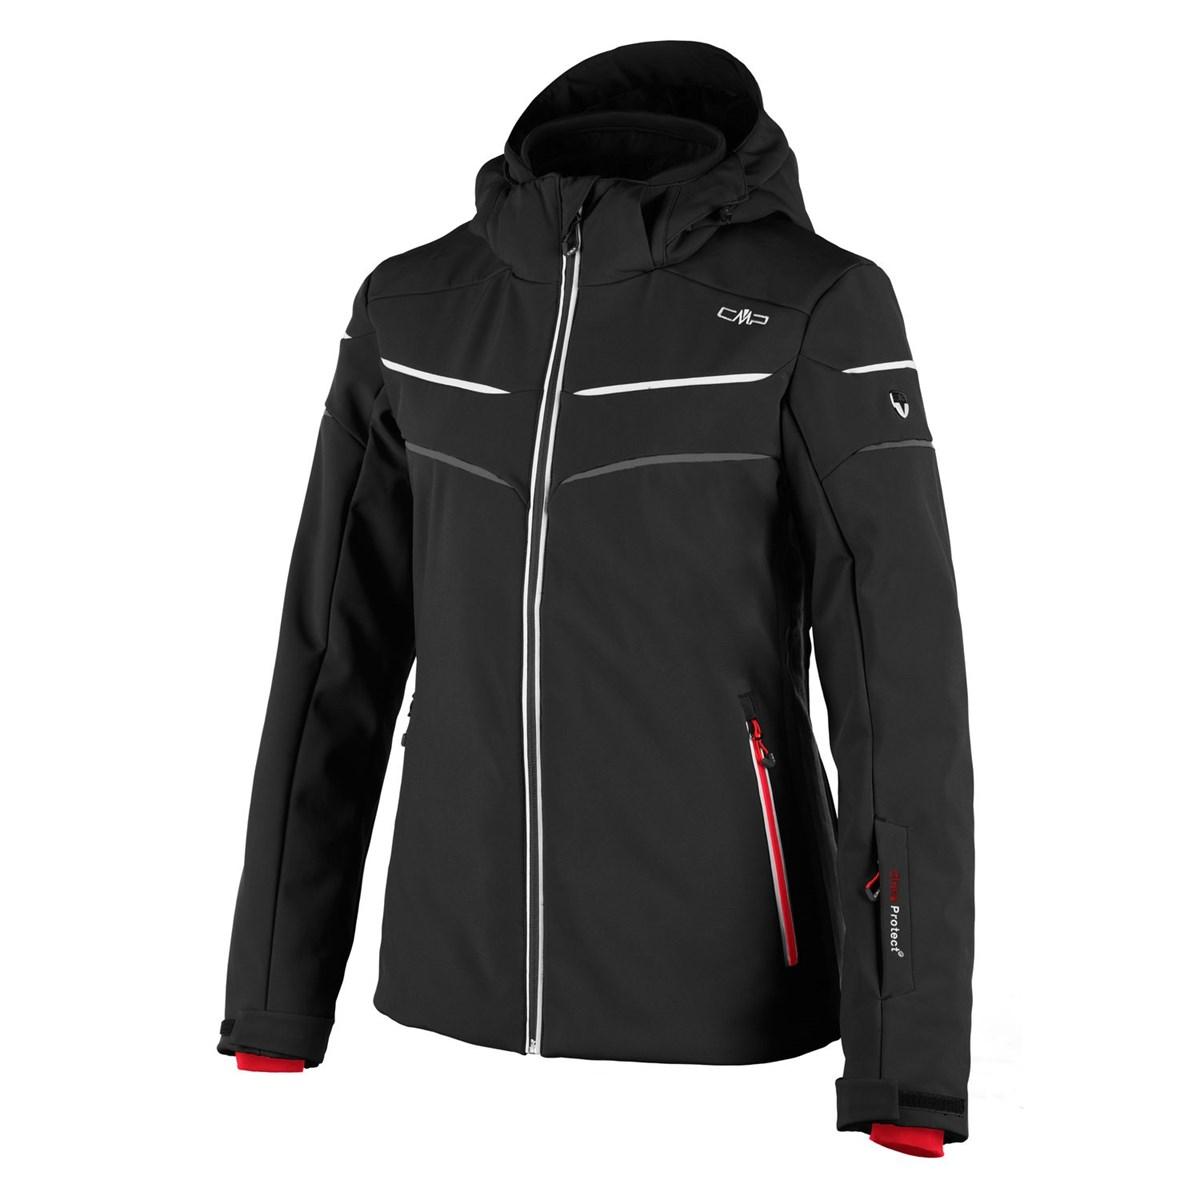 387db487fa Campagnolo Nola Womens Softshell Ski Jacket in Nero The Ski Shop £159.00